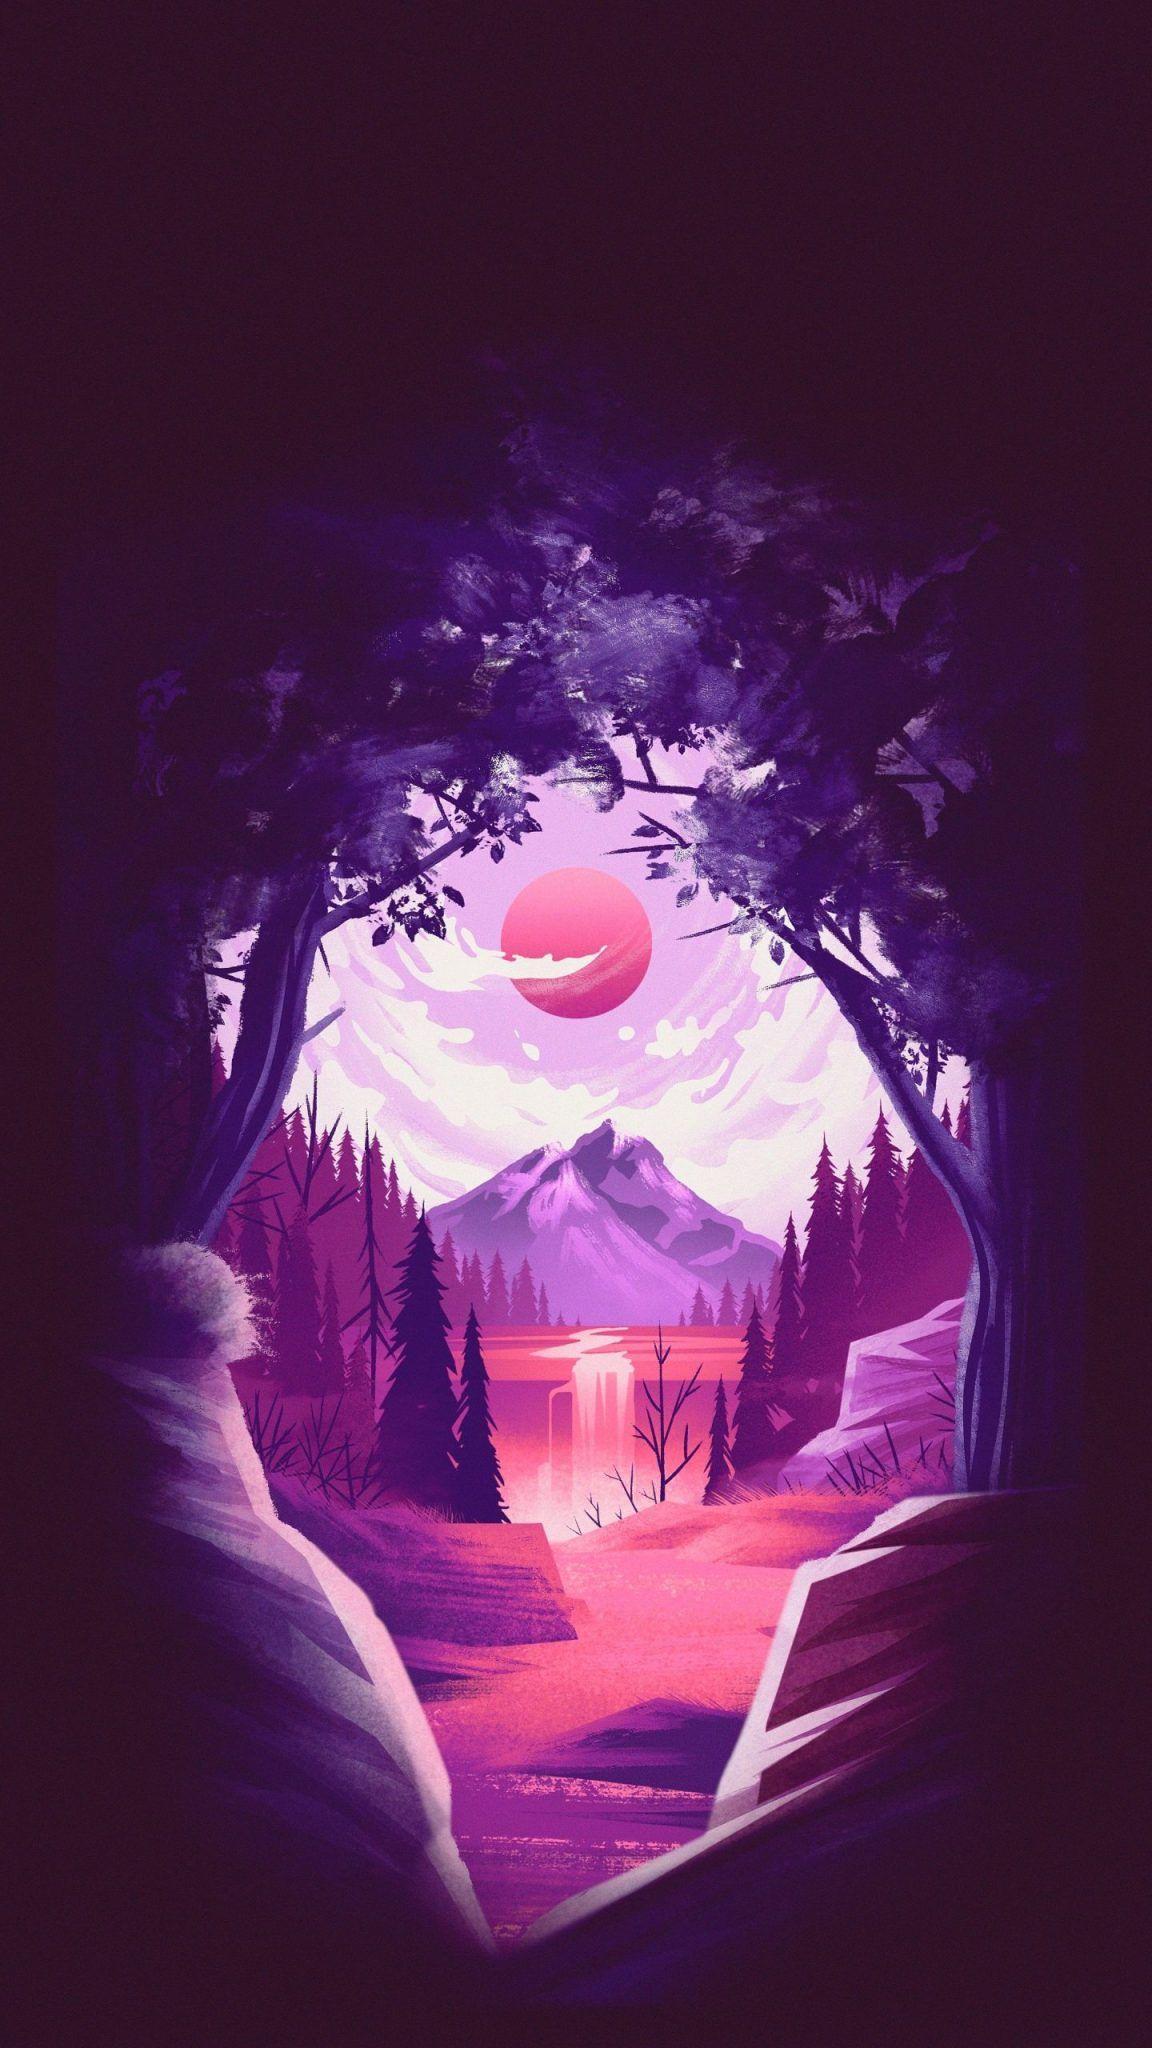 Amoled Archives Traxzee Minimal Wallpaper Iphone Wallpaper Landscape Anime Scenery Wallpaper